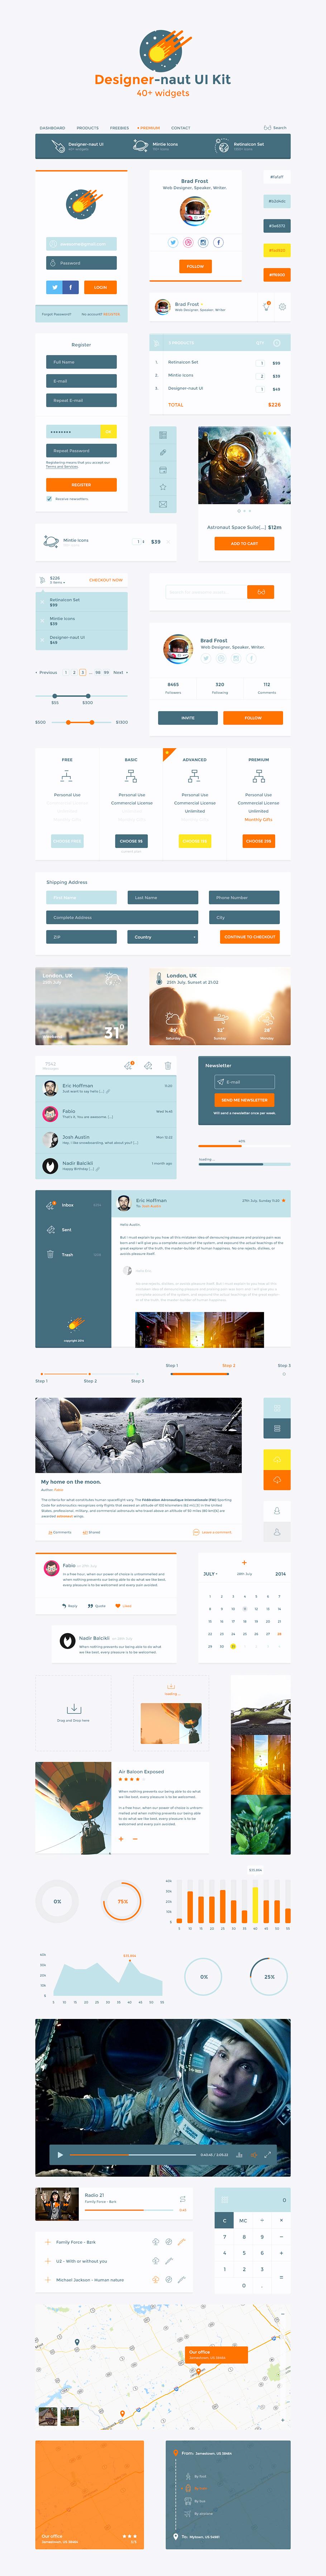 Designer-naut UI Kit.jpg